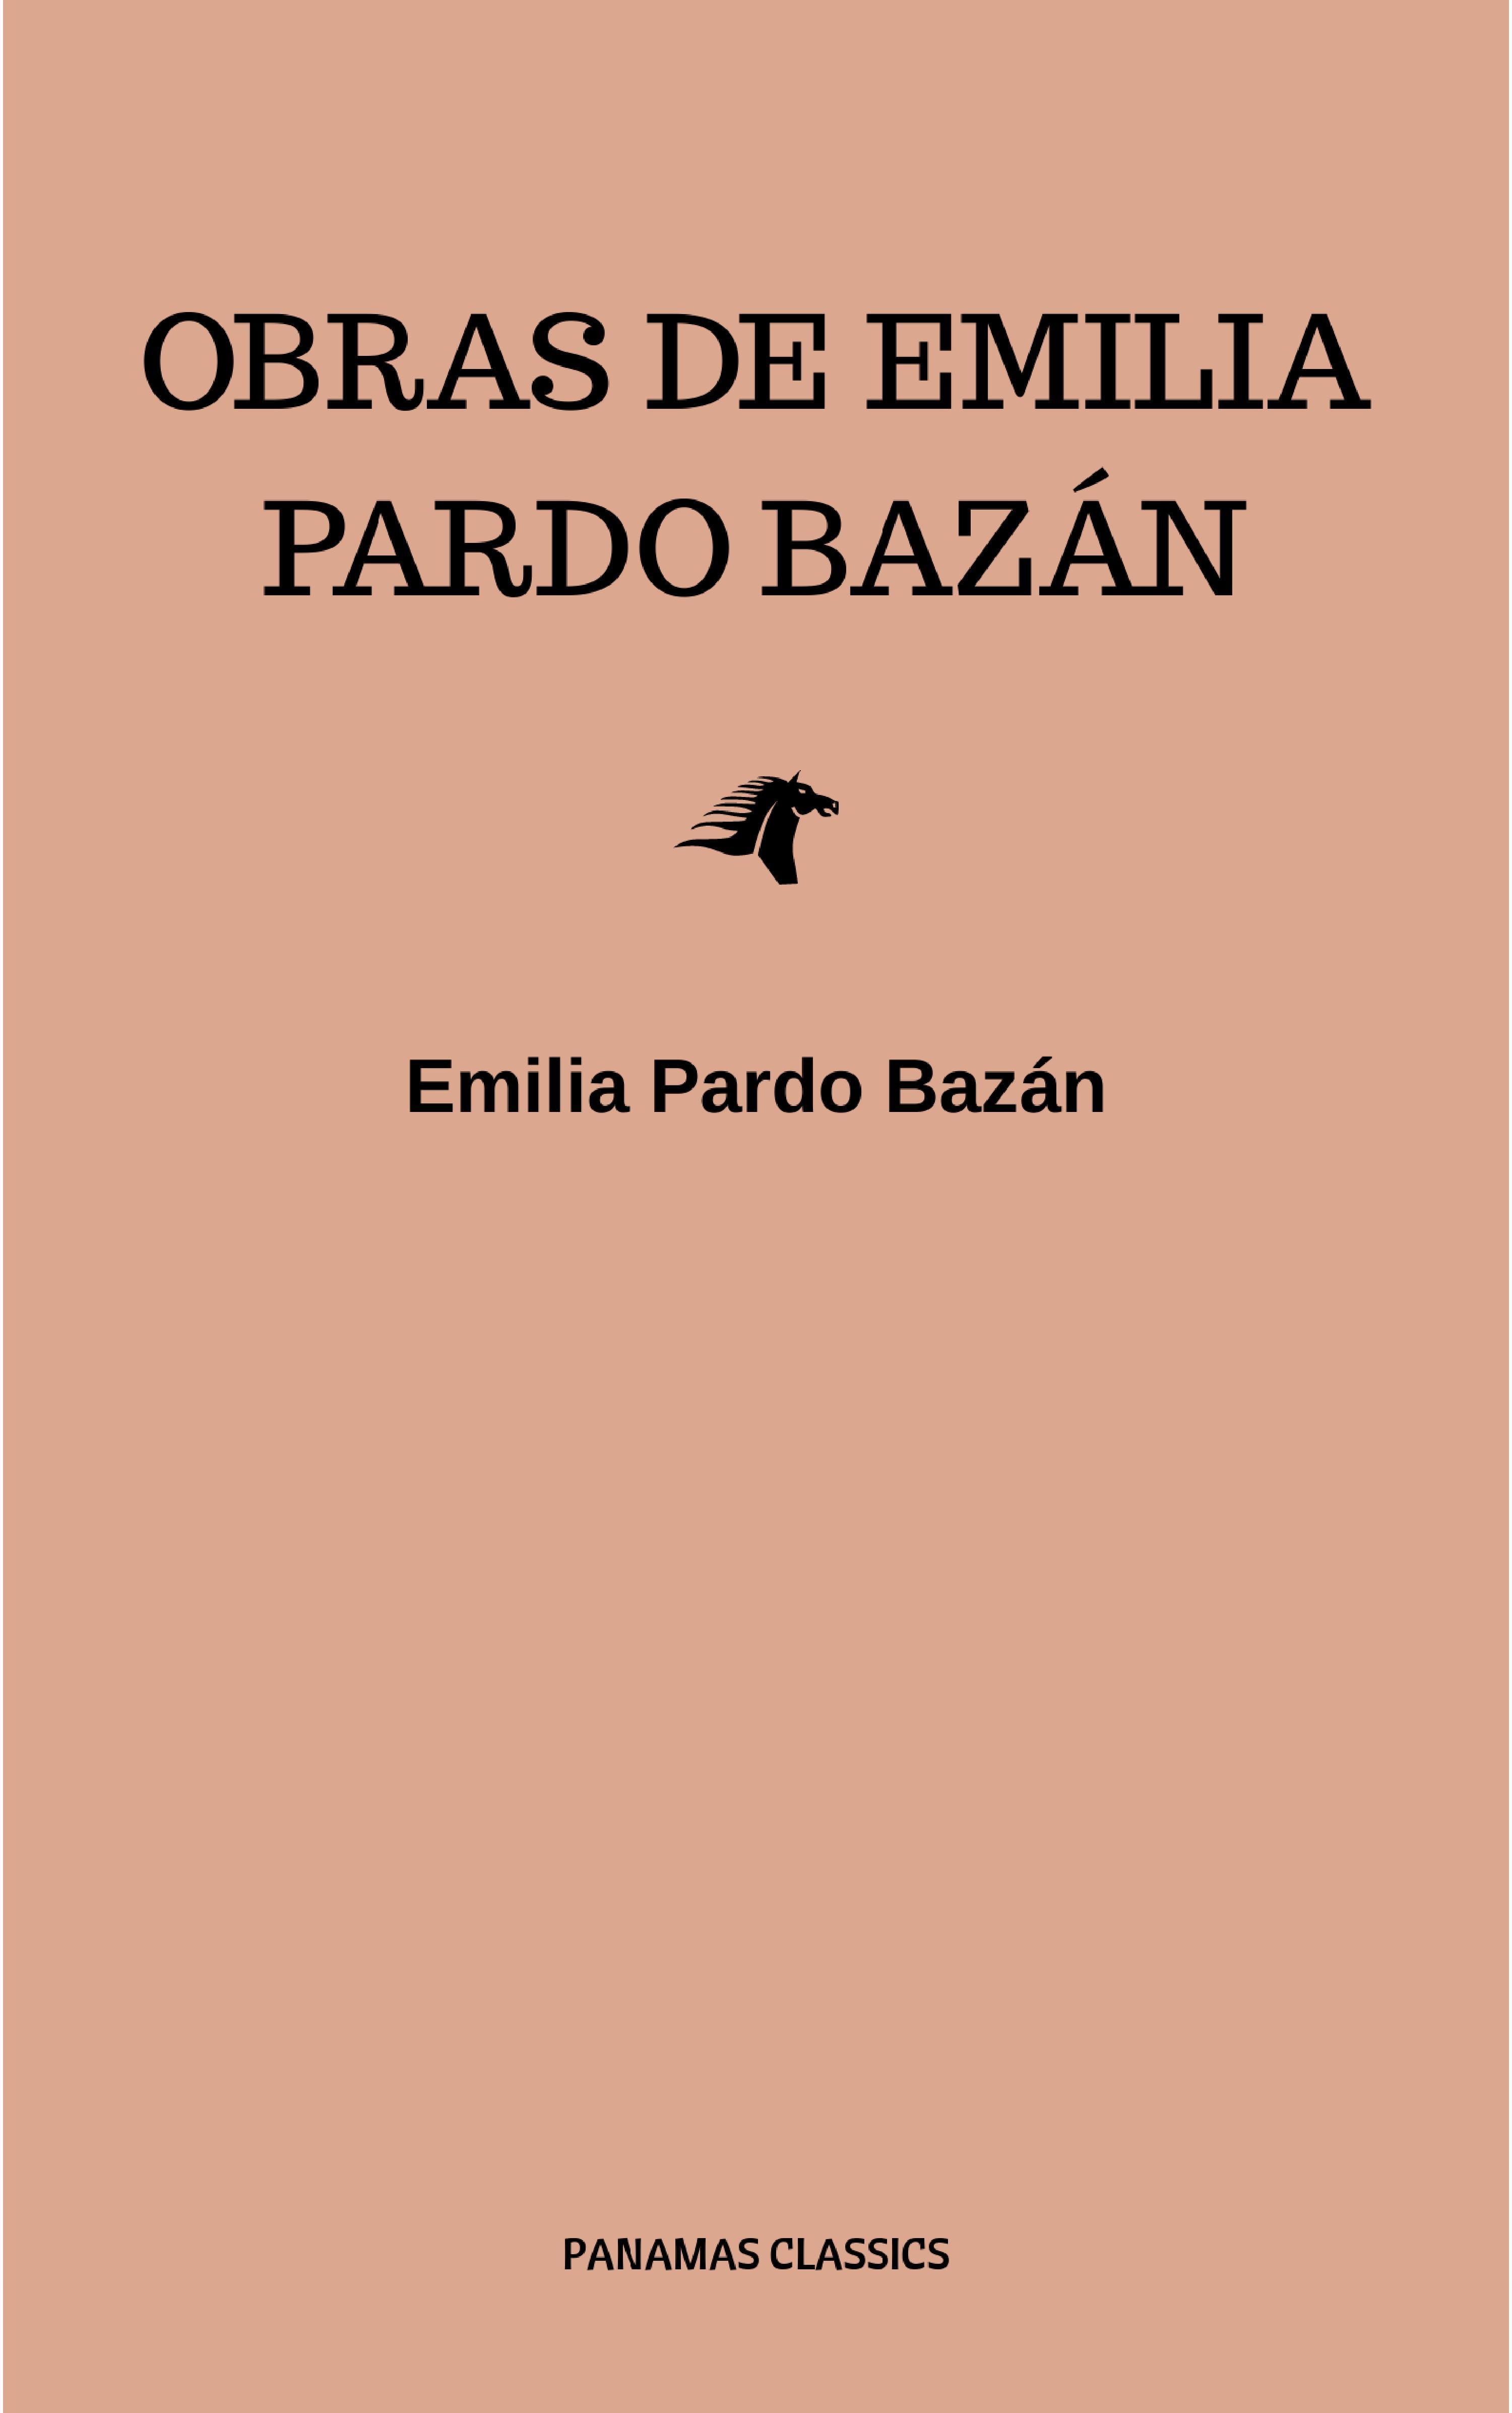 Emilia Pardo Bazan Obras de Emilia Pardo Bazán туфли emilia estra emilia estra mp002xw1io1u